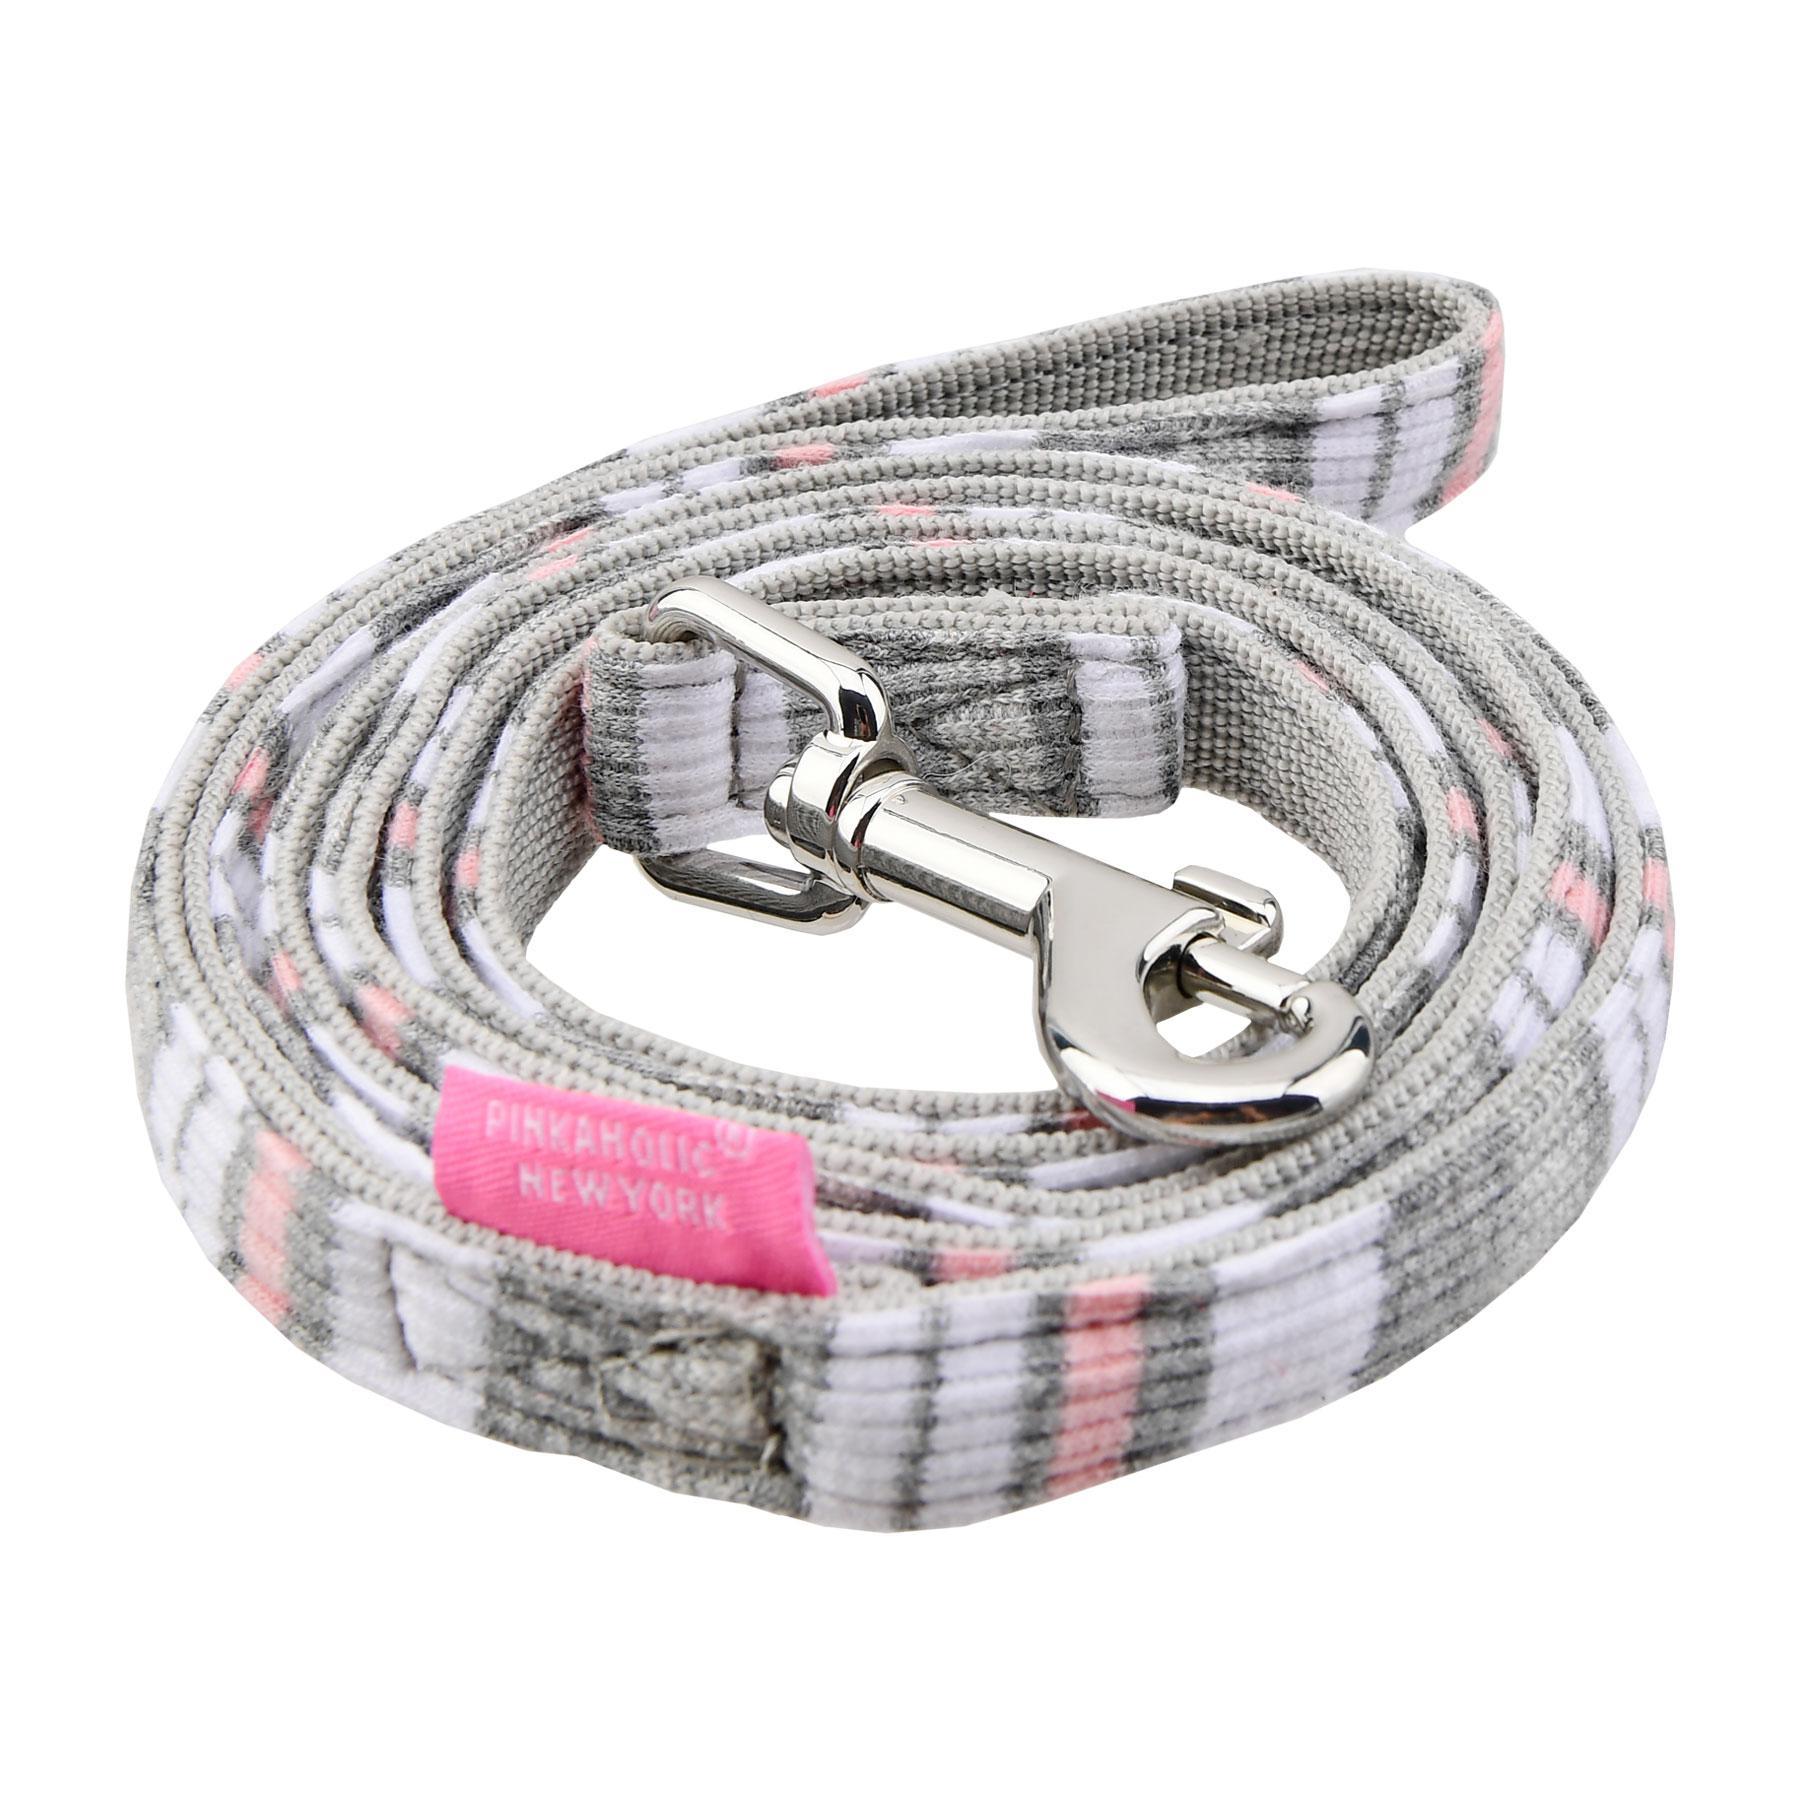 Cara Dog Leash by Pinkaholic - Grey